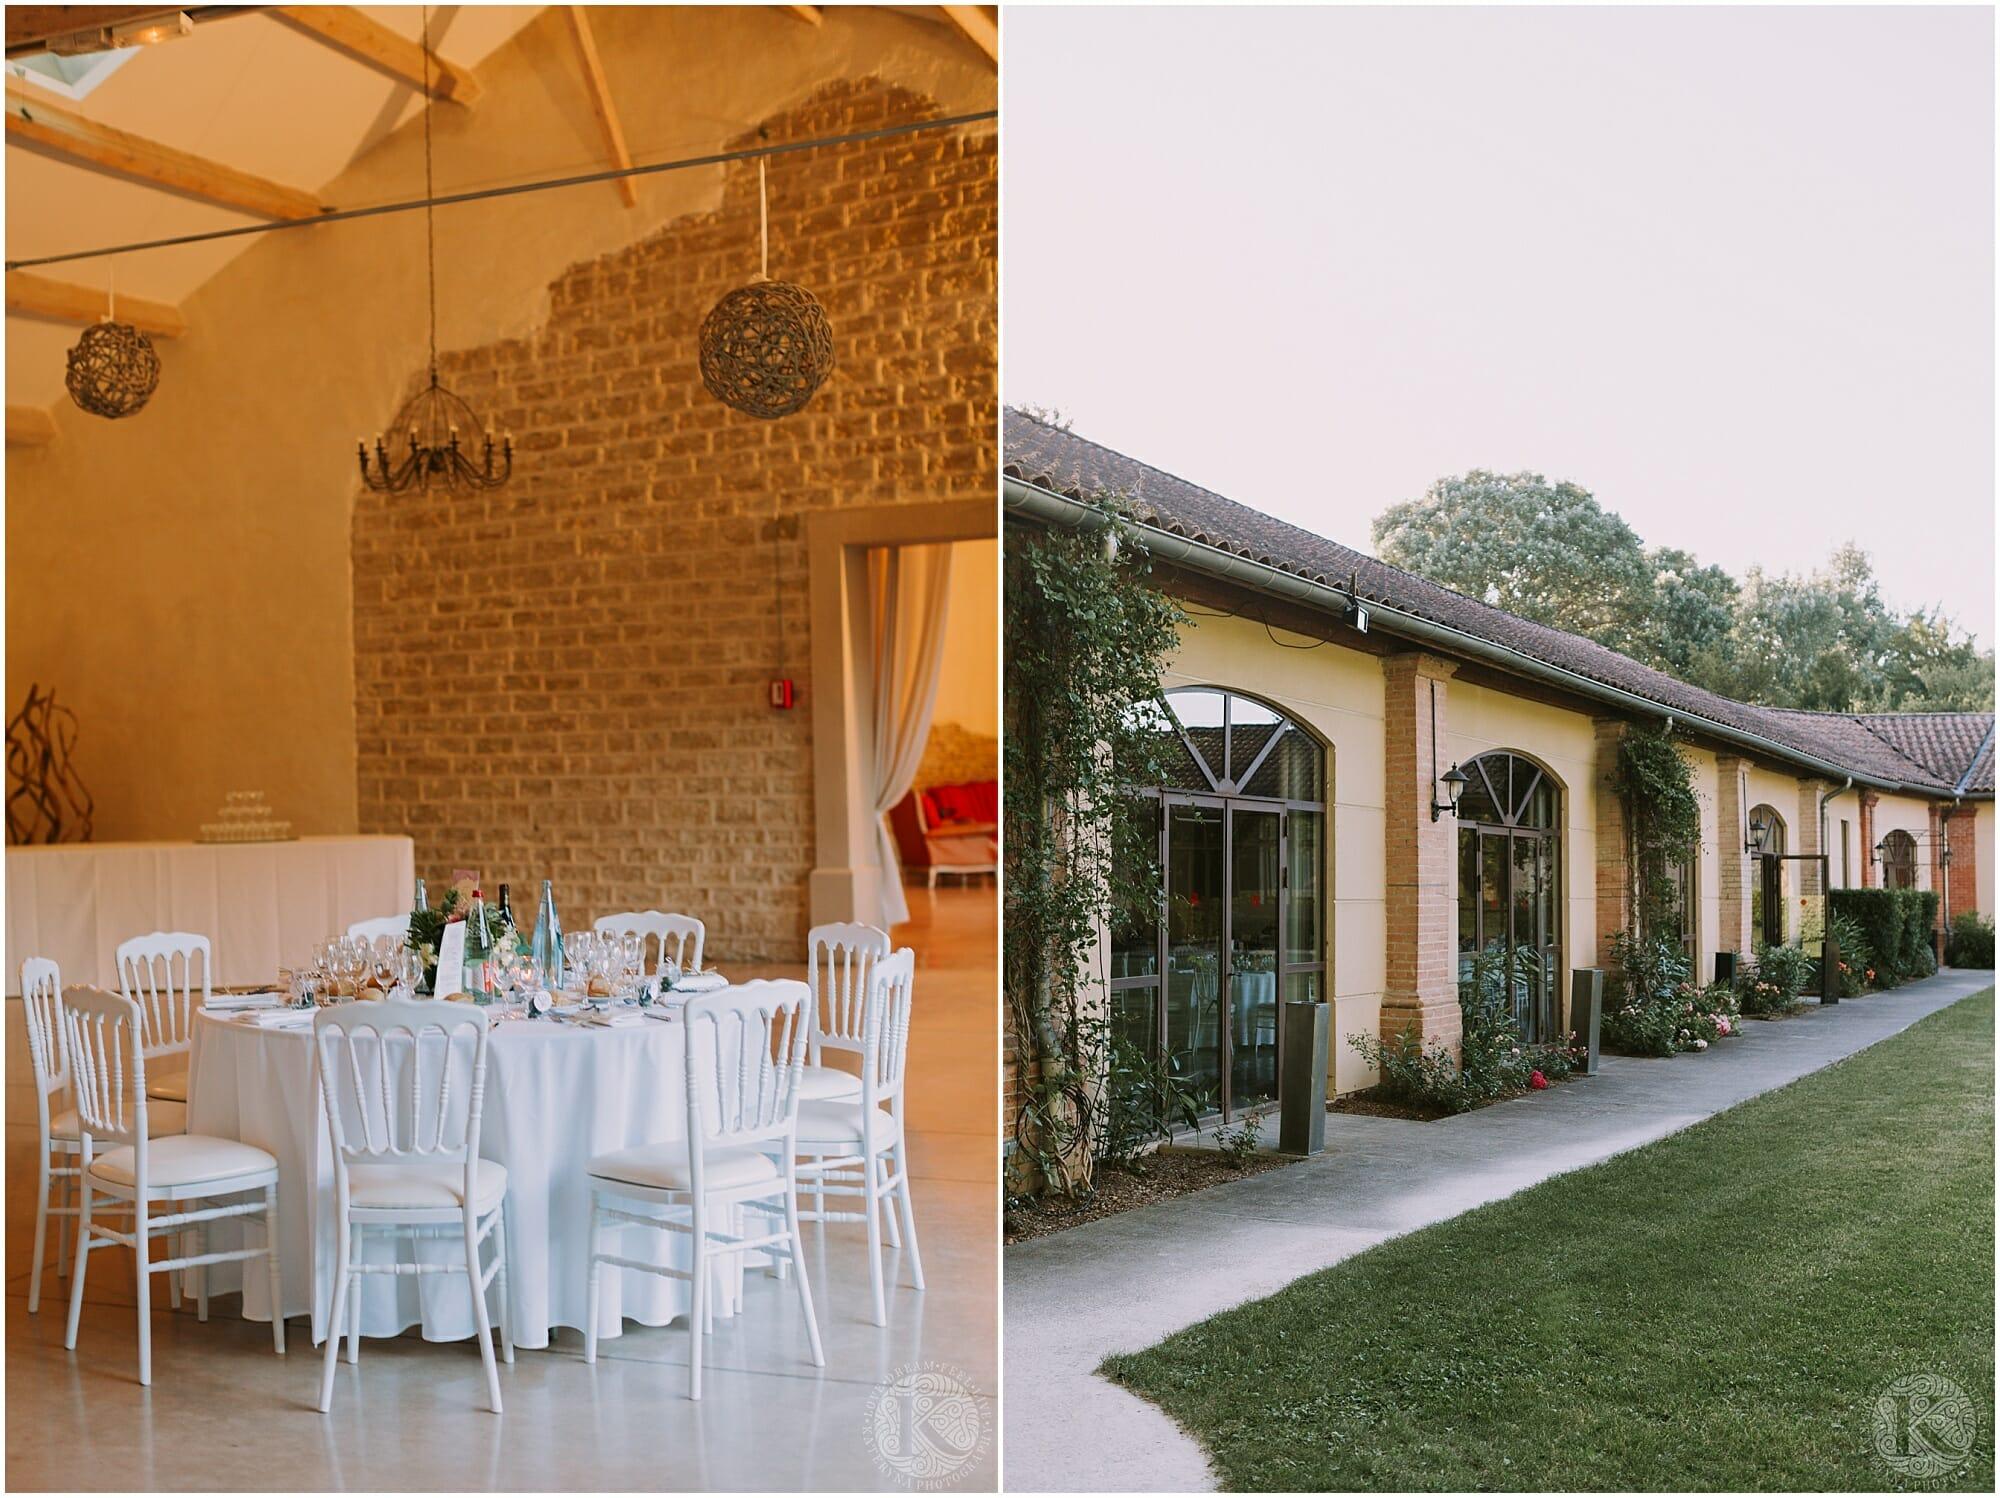 Kateryna-photos-photographe-mariage-chateau-des-3-fontaines-provence-avignon-vaucluse-sud_0109.jpg